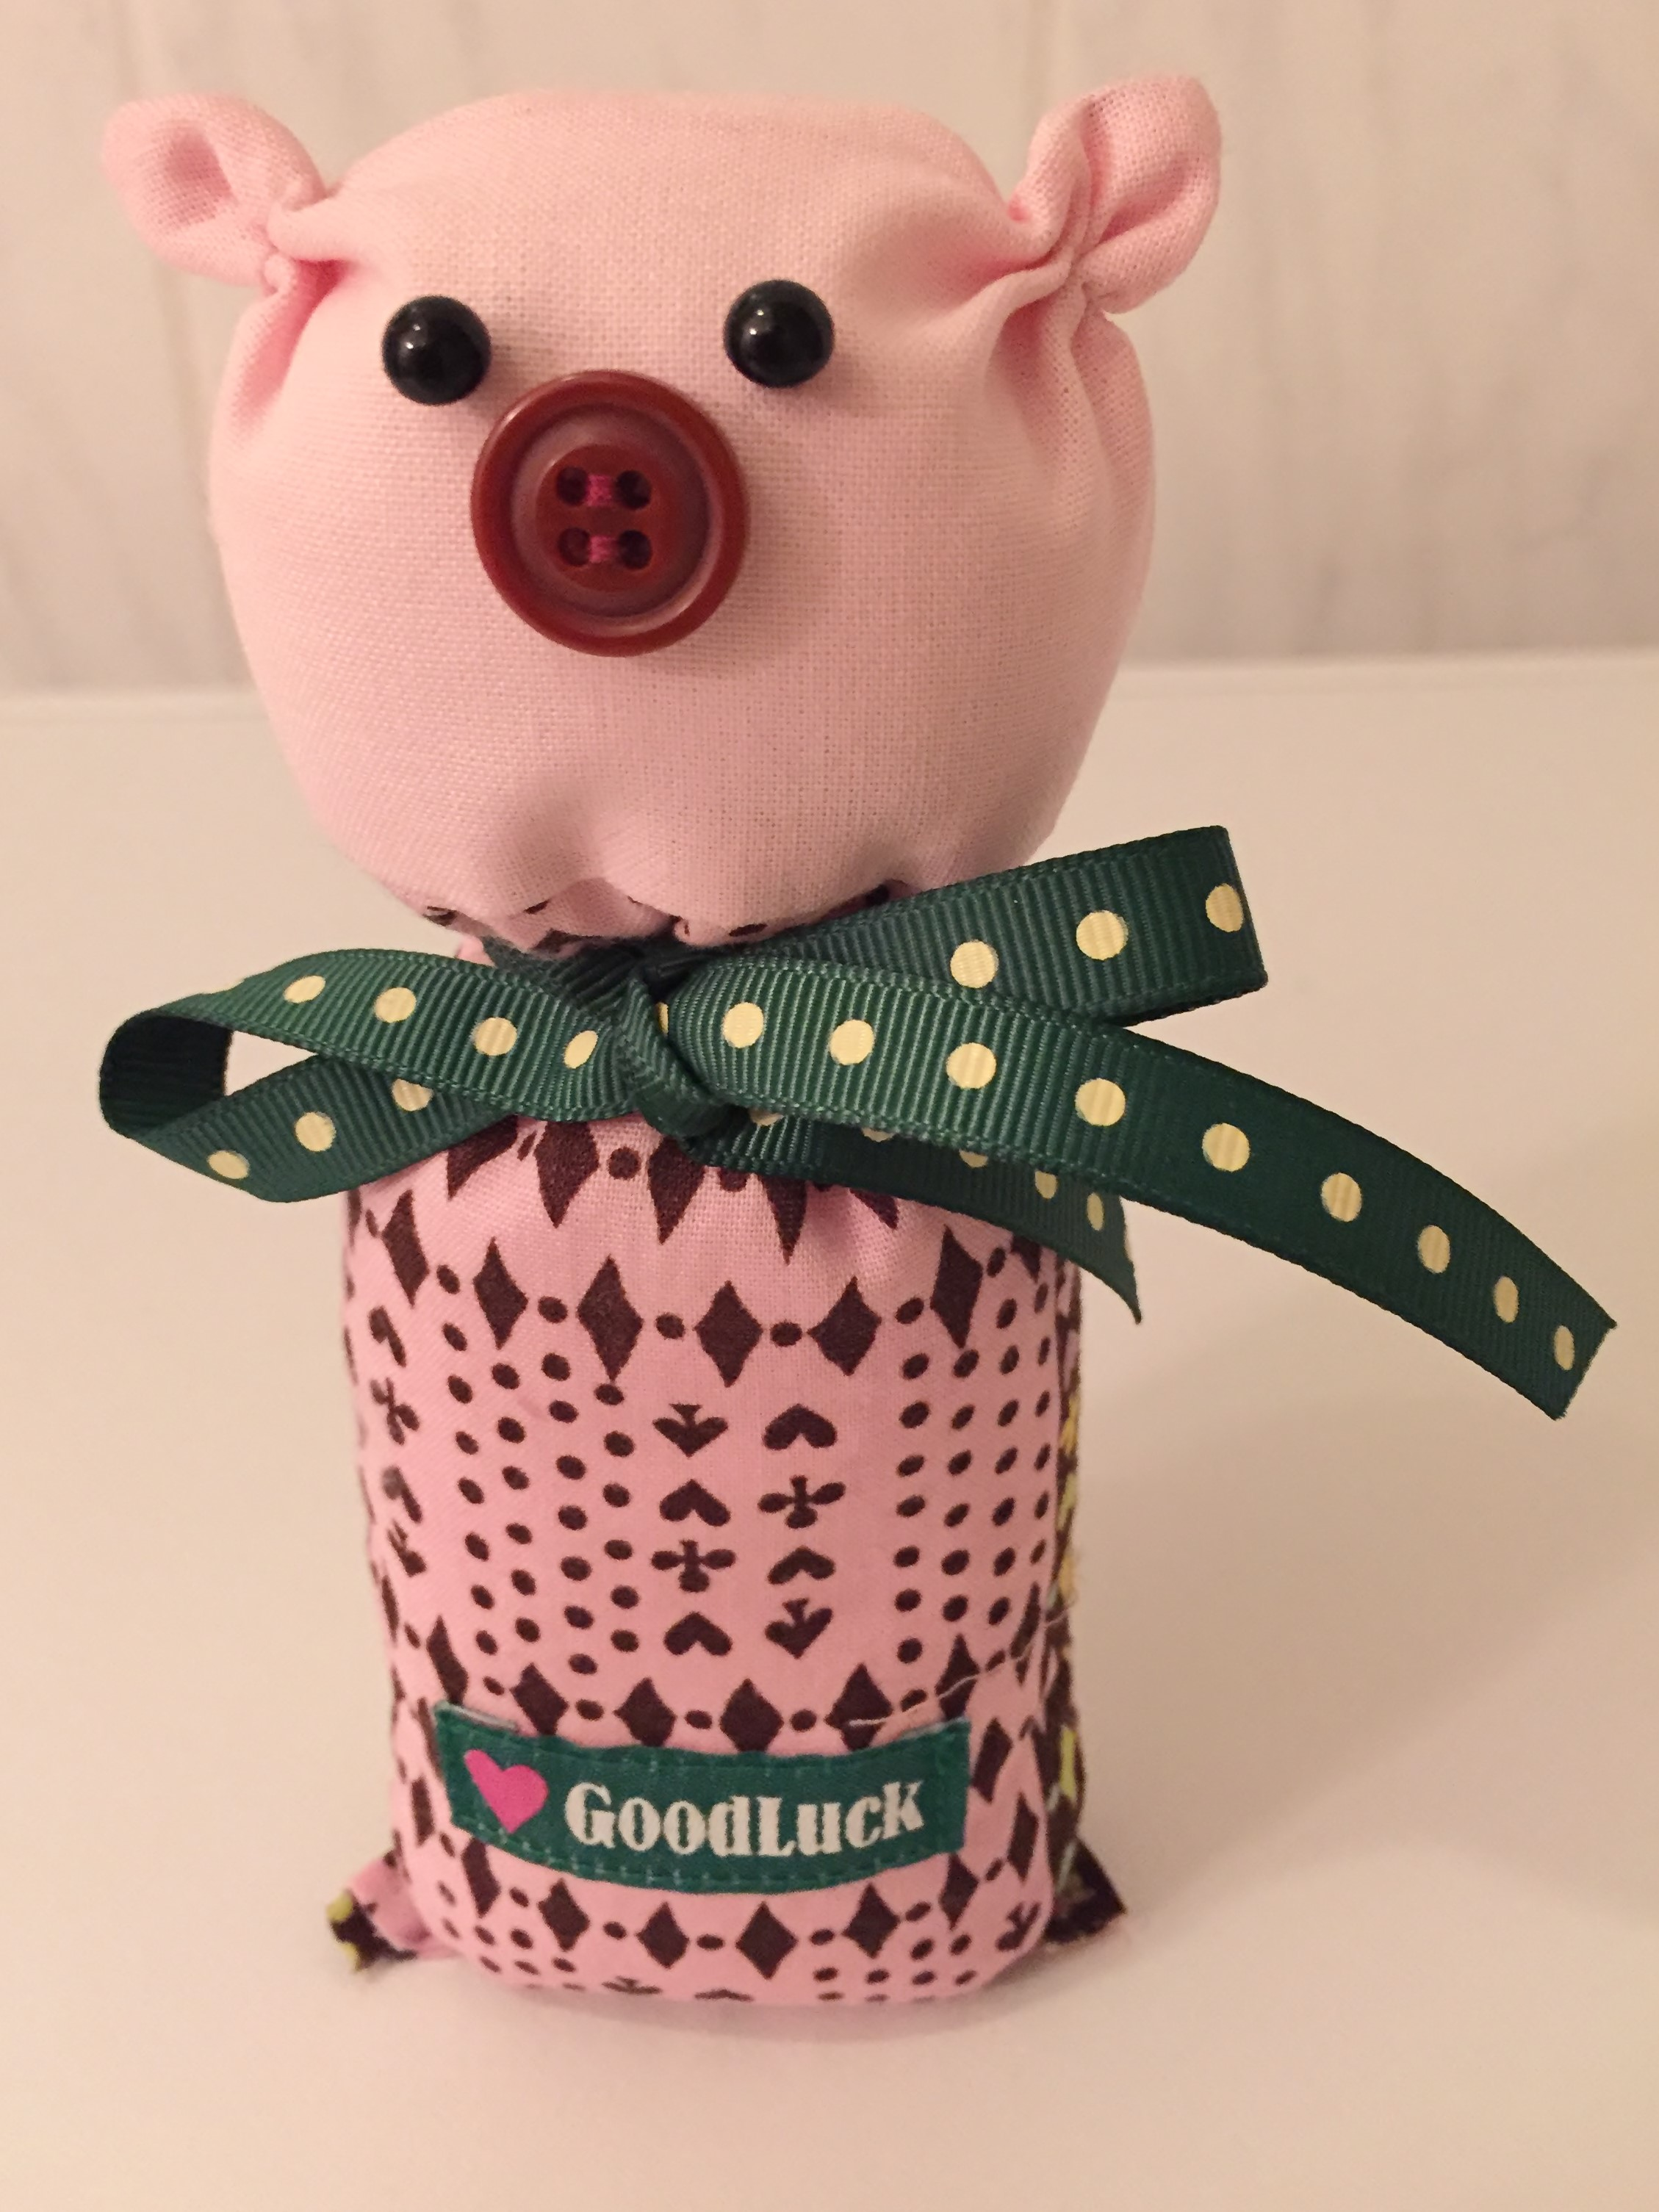 Nähanleitung: Glücksschwein als Glücksbringer nähen